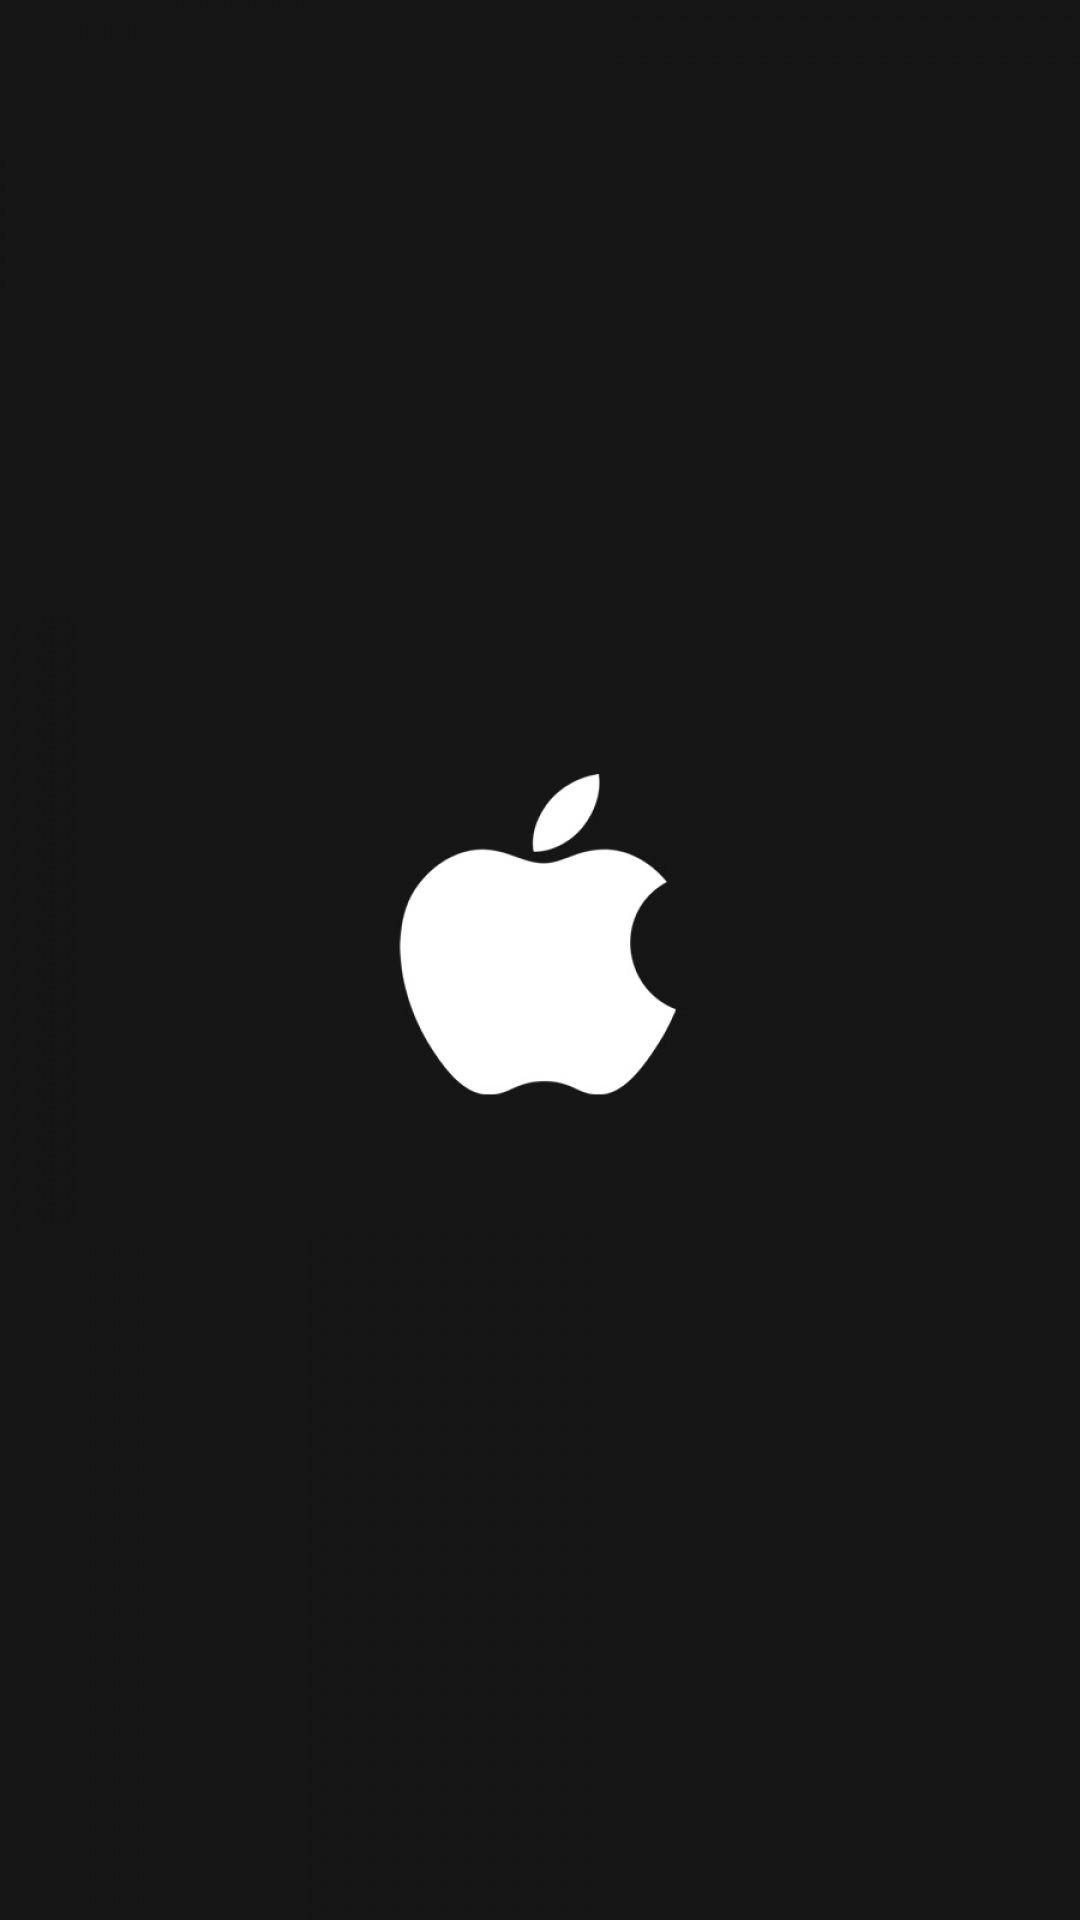 B w quenalbertini apple logo iphone wallpaper